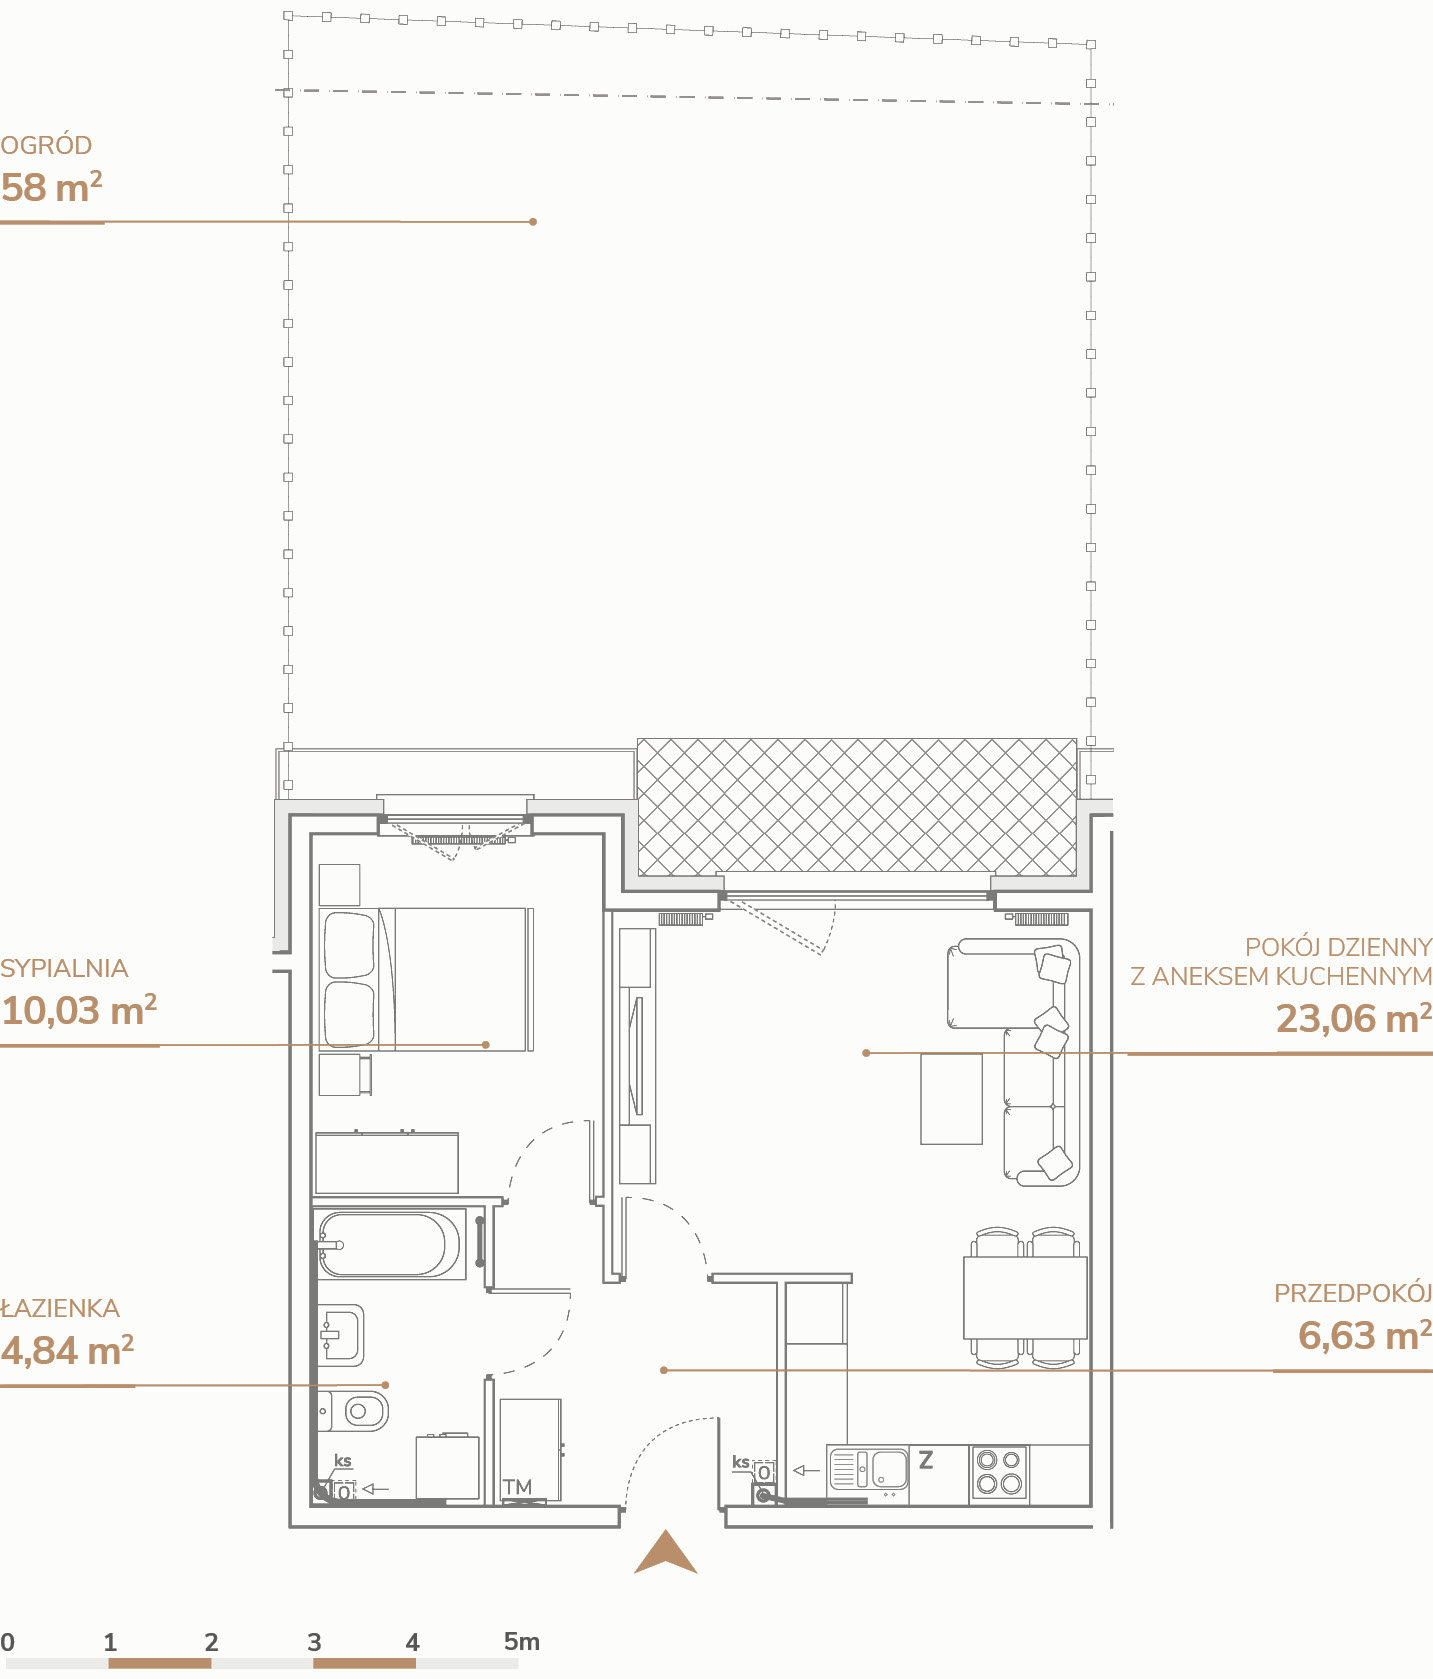 Mieszkanie B2.0.5